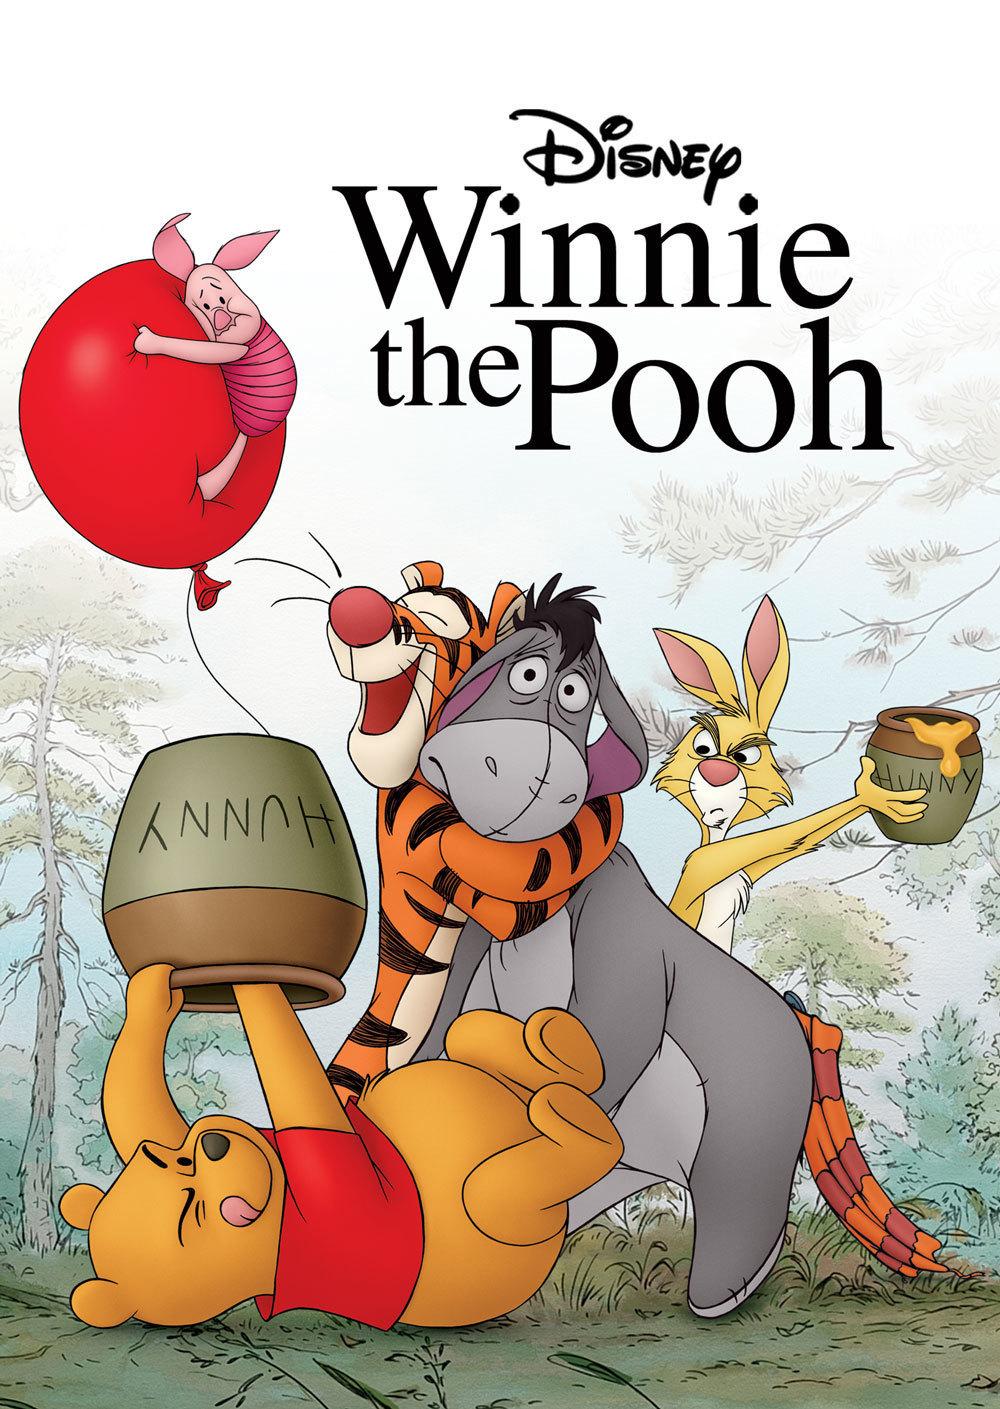 PC:https://movies.disney.com/winnie-the-pooh